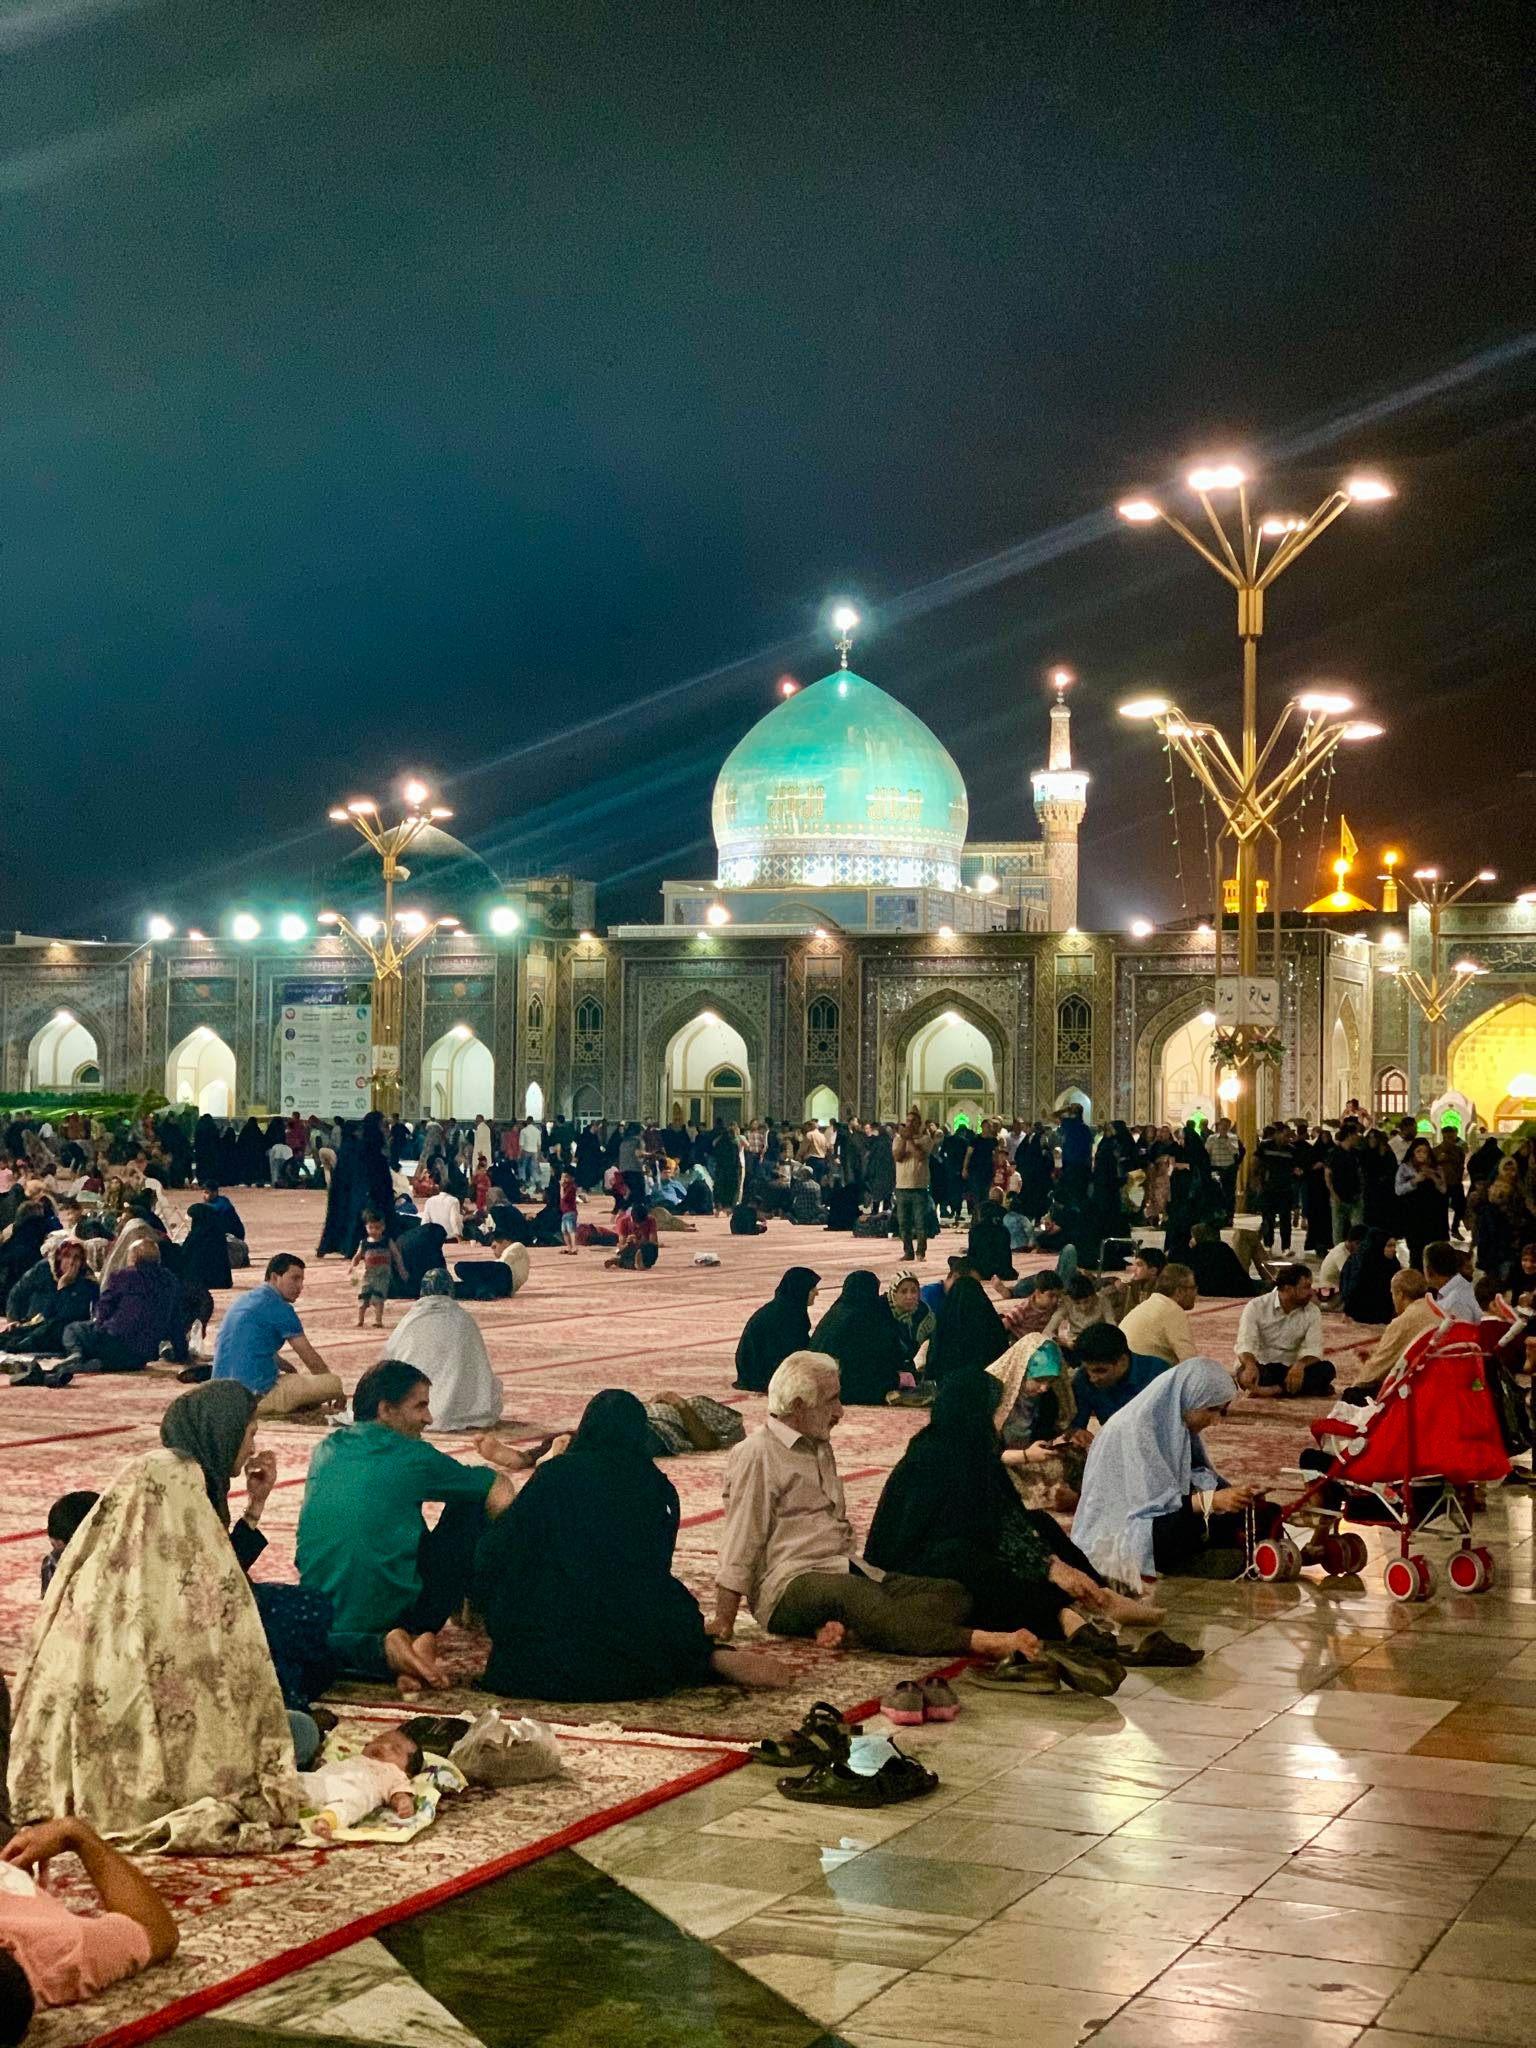 Kach Solo Travels in 2019 Overnight in Mashhad8.jpg